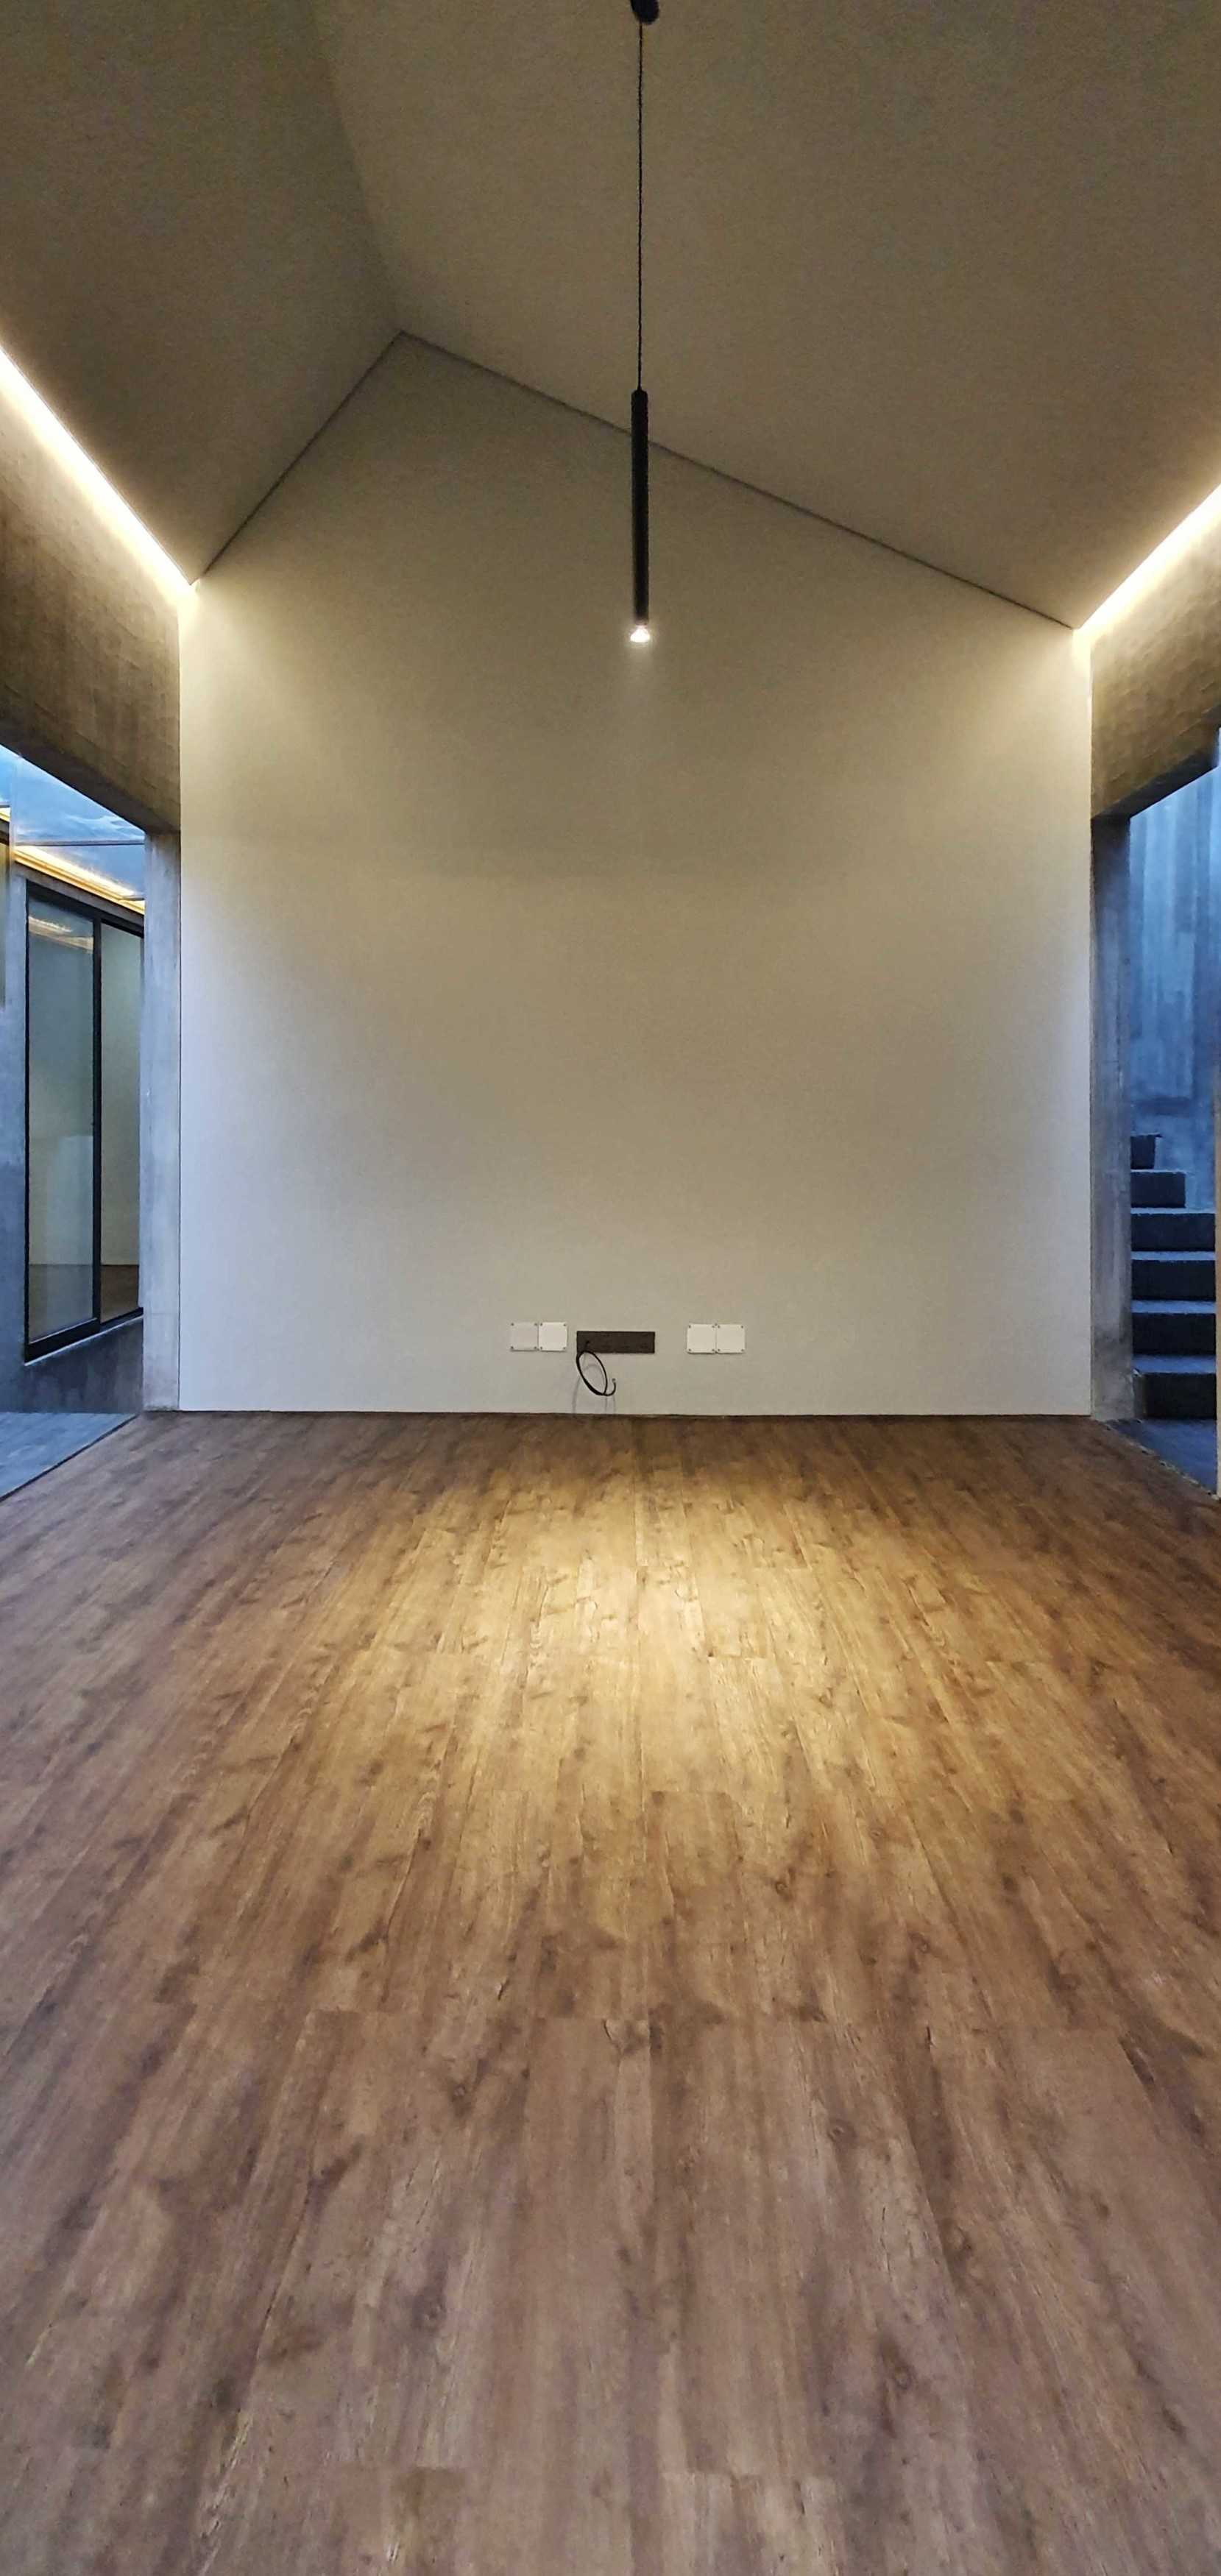 Atelier Anima Grey House Jatibening, Kec. Pondokgede, Kota Bks, Jawa Barat, Indonesia Jatibening, Kec. Pondokgede, Kota Bks, Jawa Barat, Indonesia Atelier-Anima-Grey-House   94851